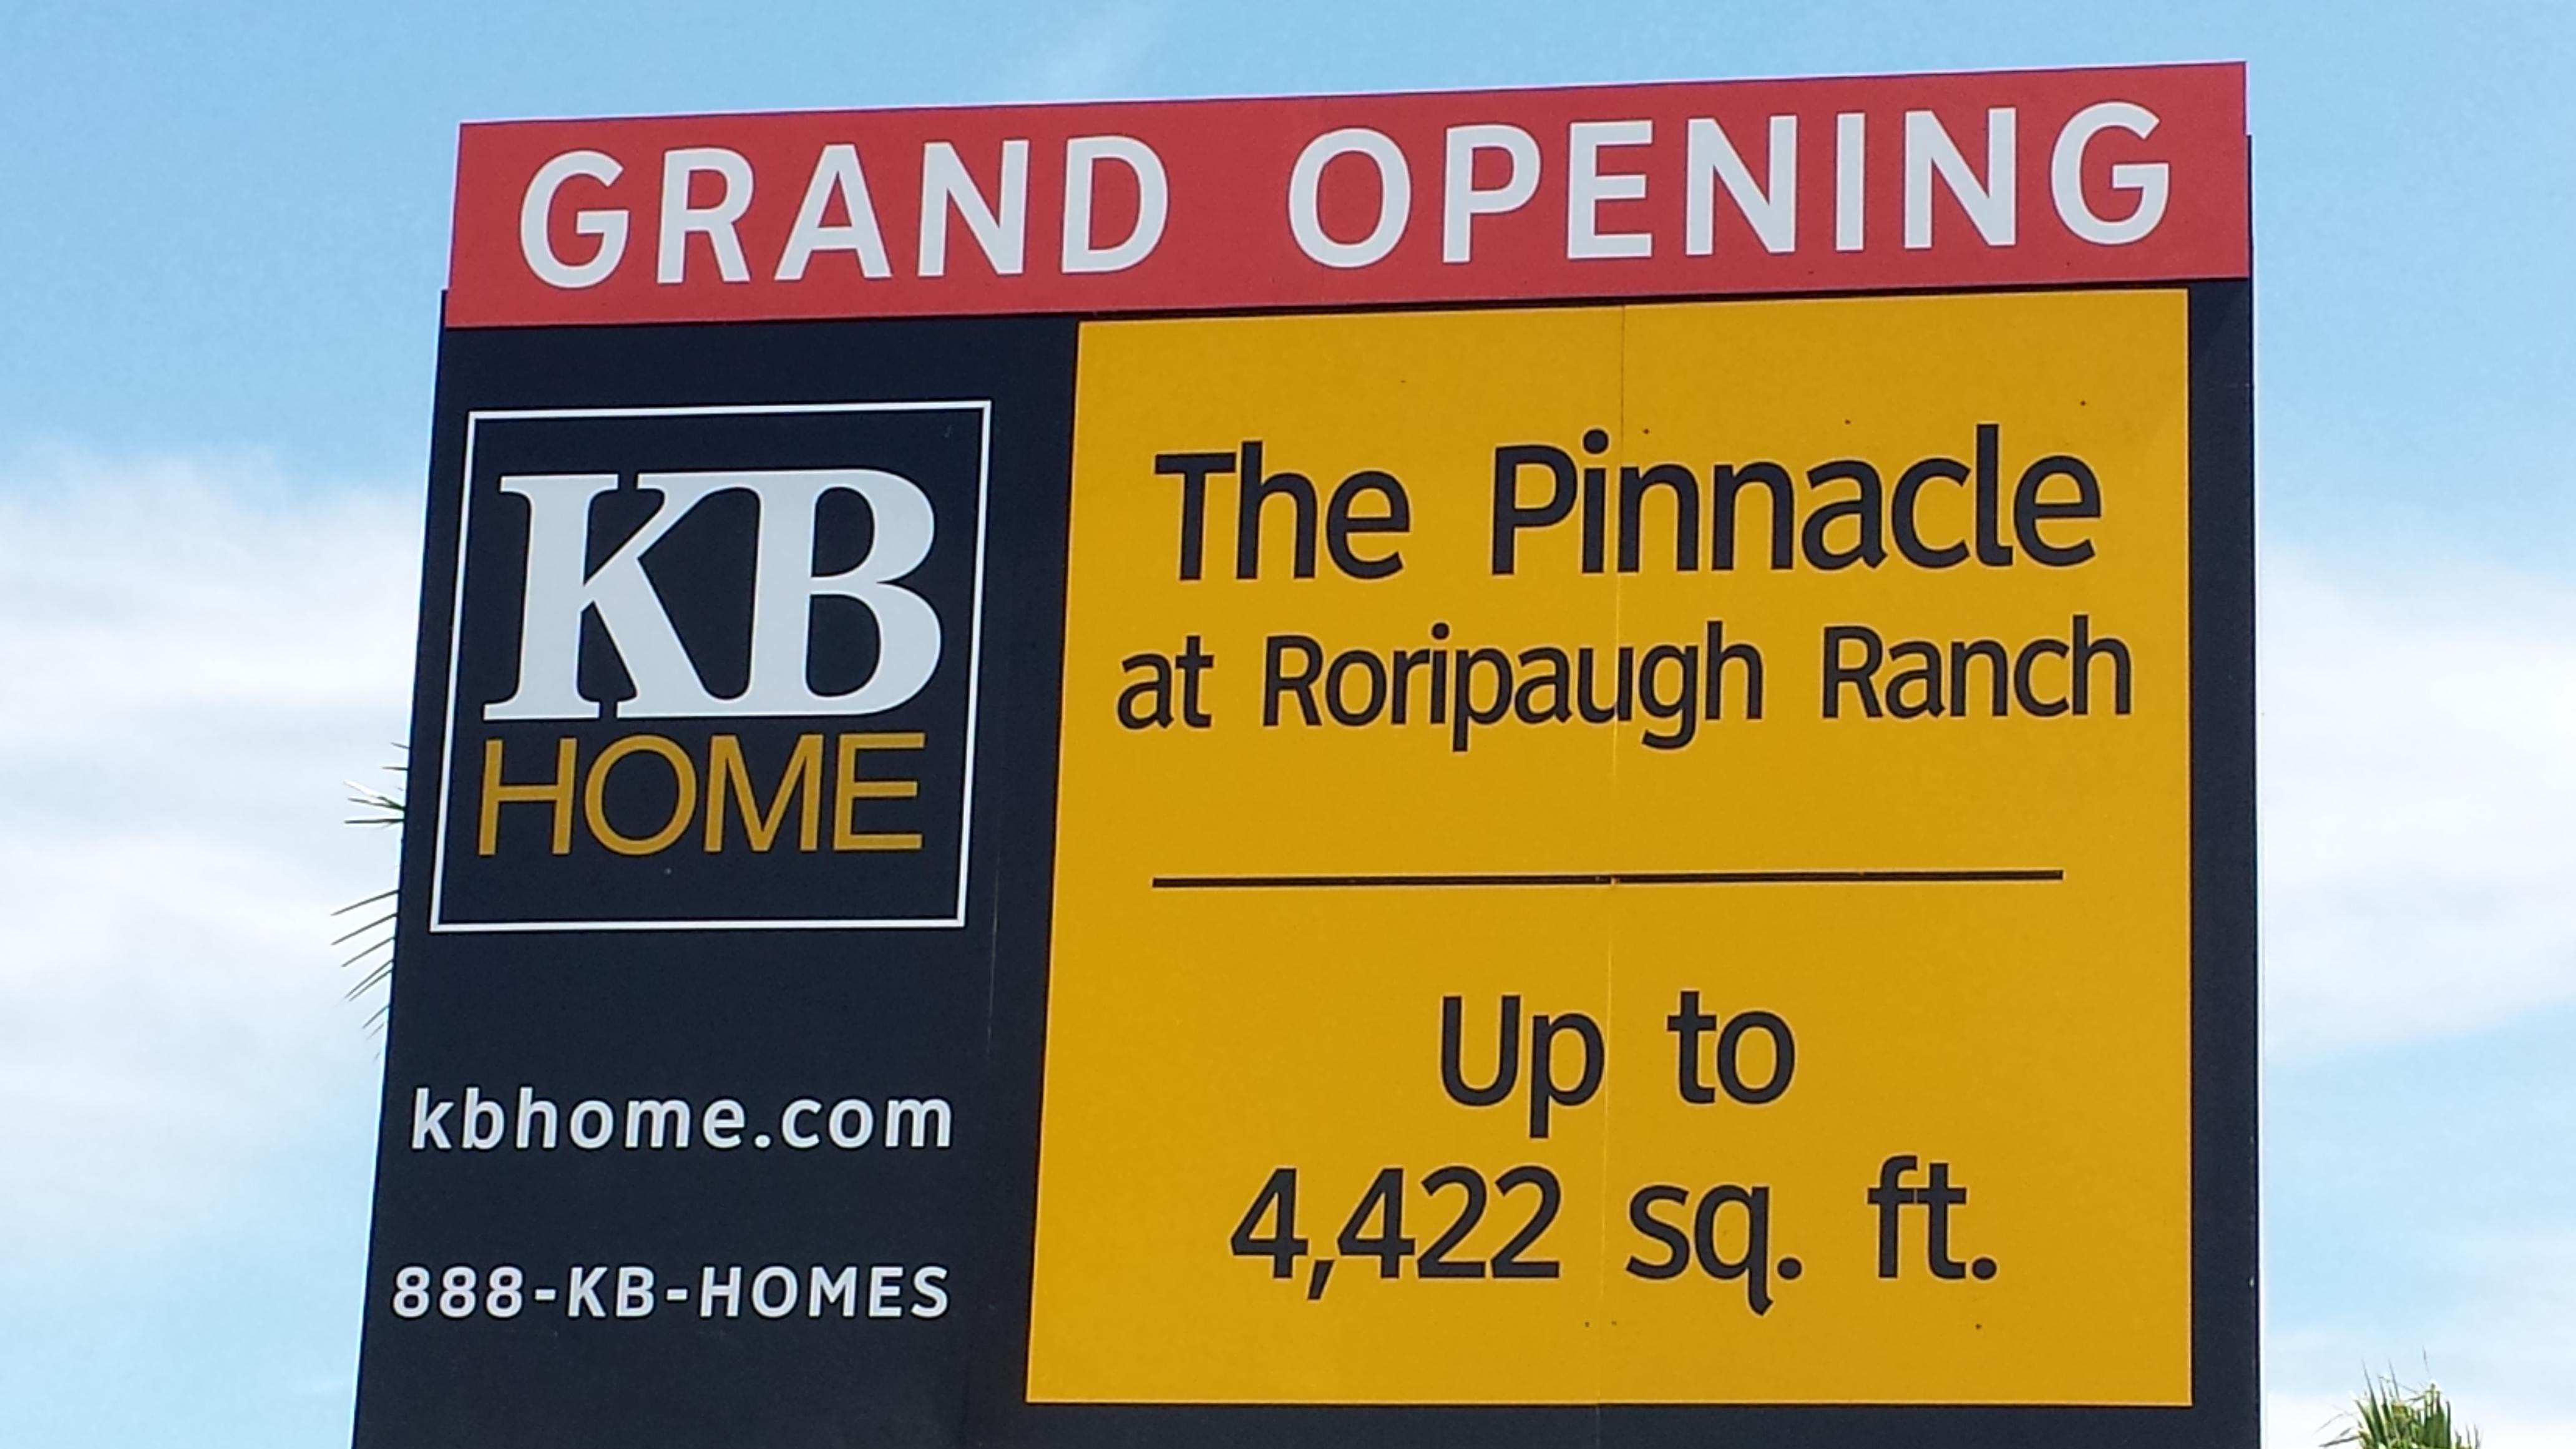 KB Homes at Roripaugh Ranch in Temeucla